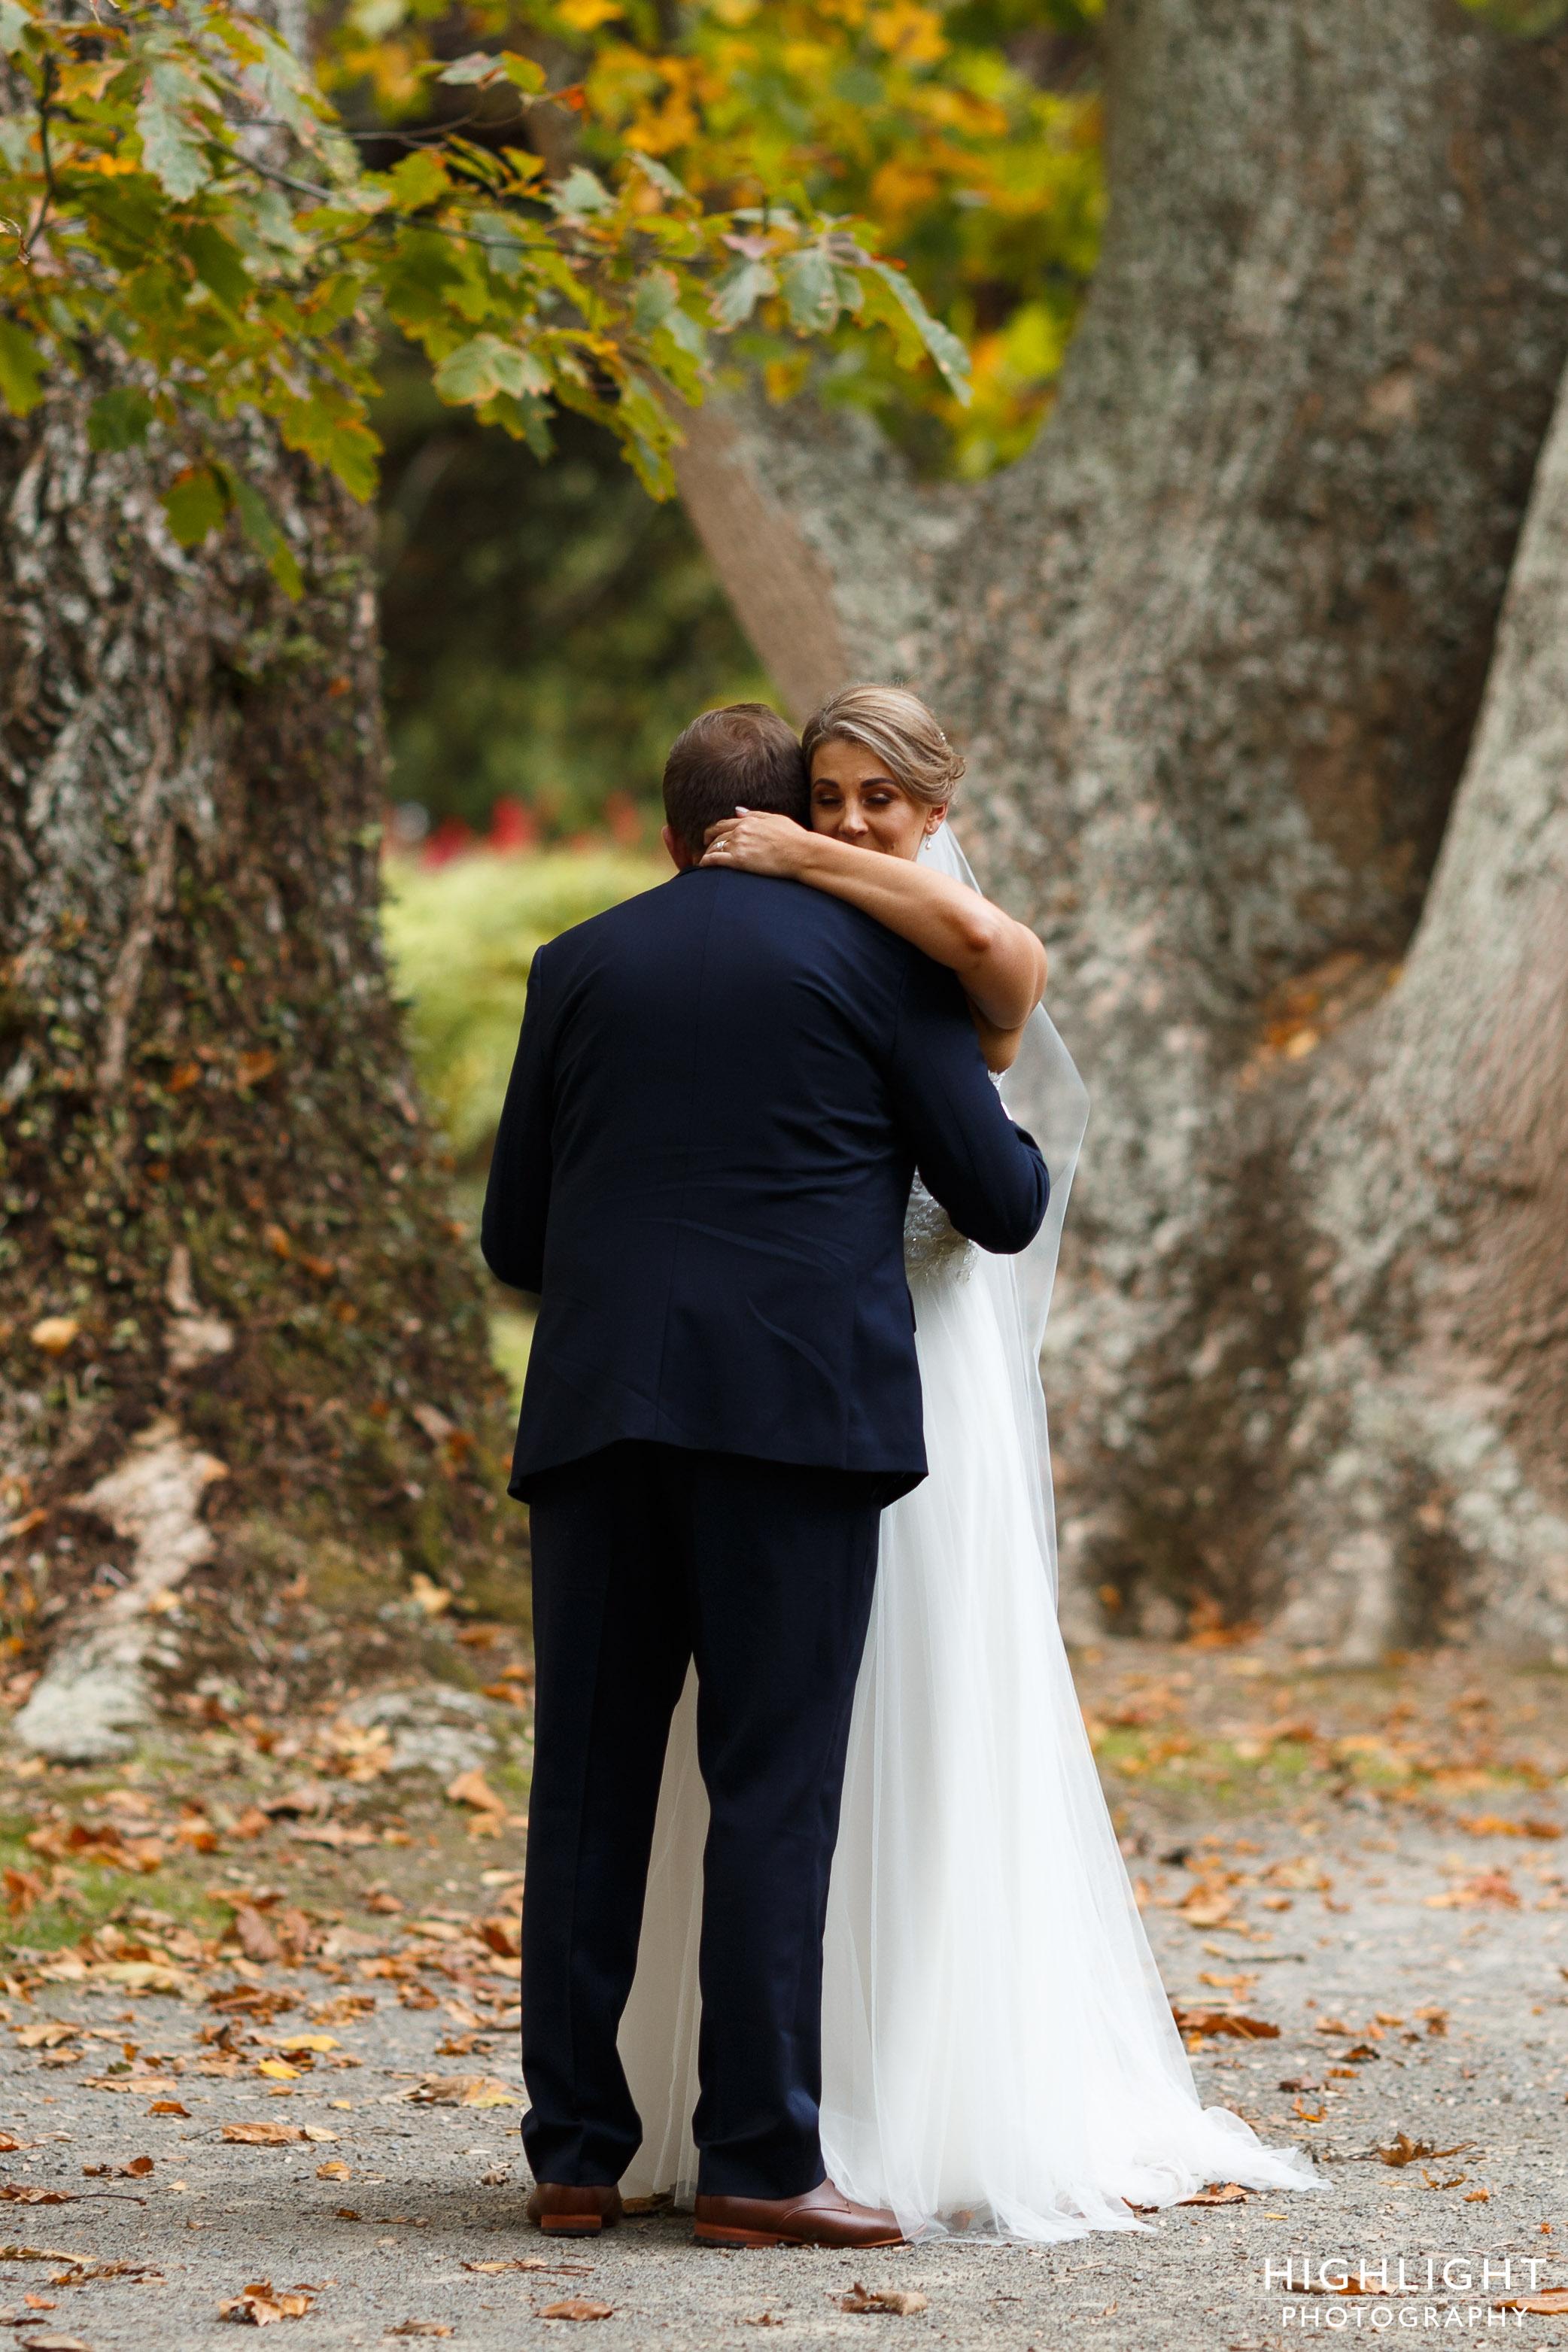 highlight-wedding-photography-palmerston-north-new-zealand-orlando-country-club-wedding-39.jpg